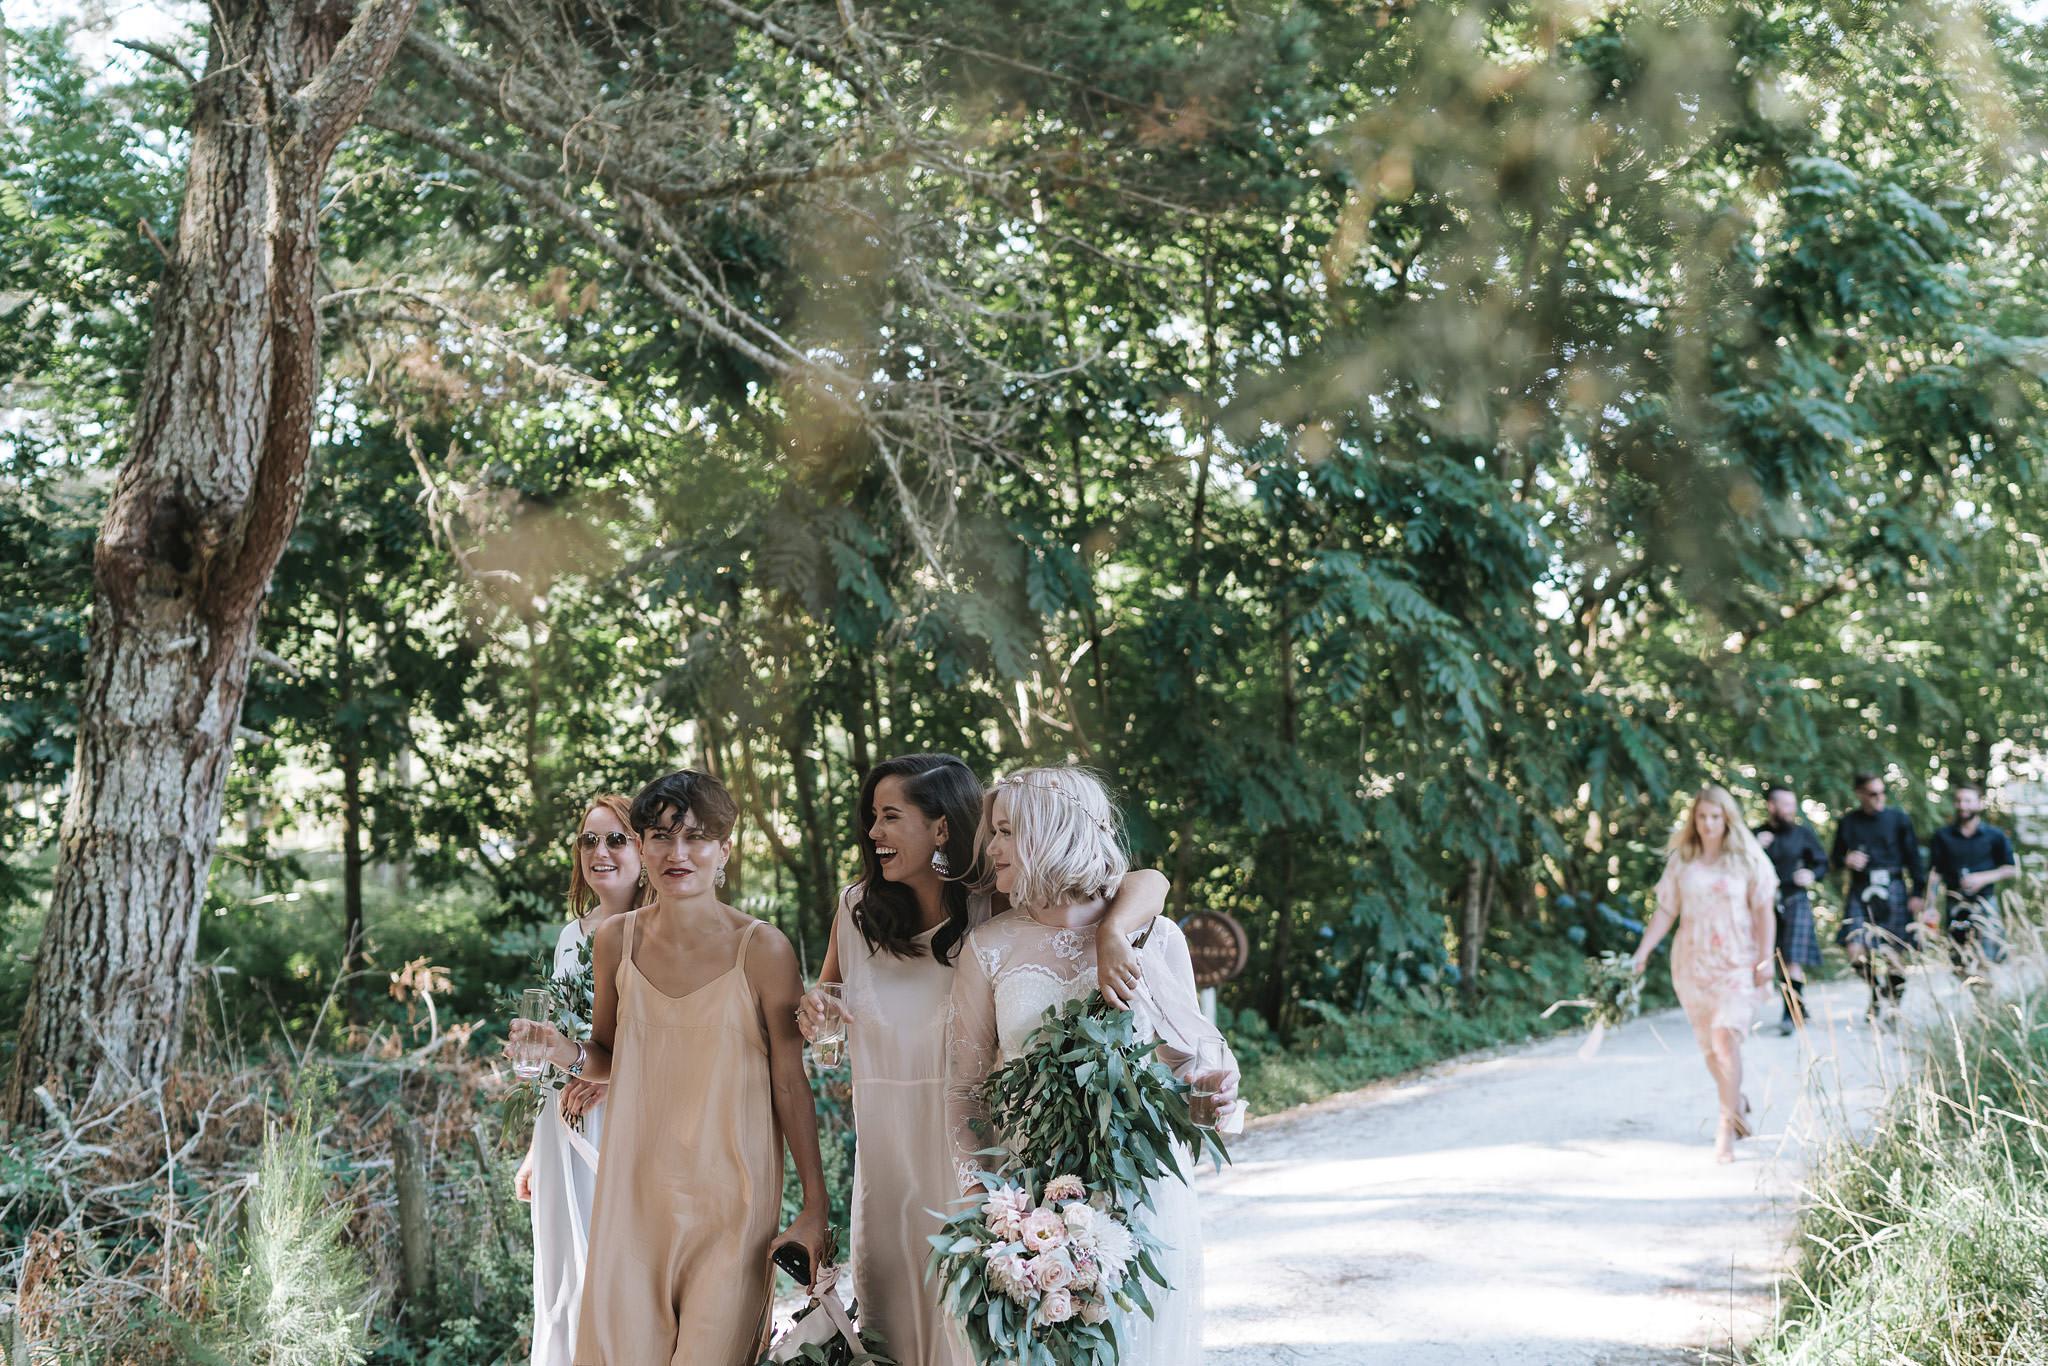 rambo-estrada-natalieryan-old-forest-school-tauranga-wedding-photographers-480-c-copy.jpg